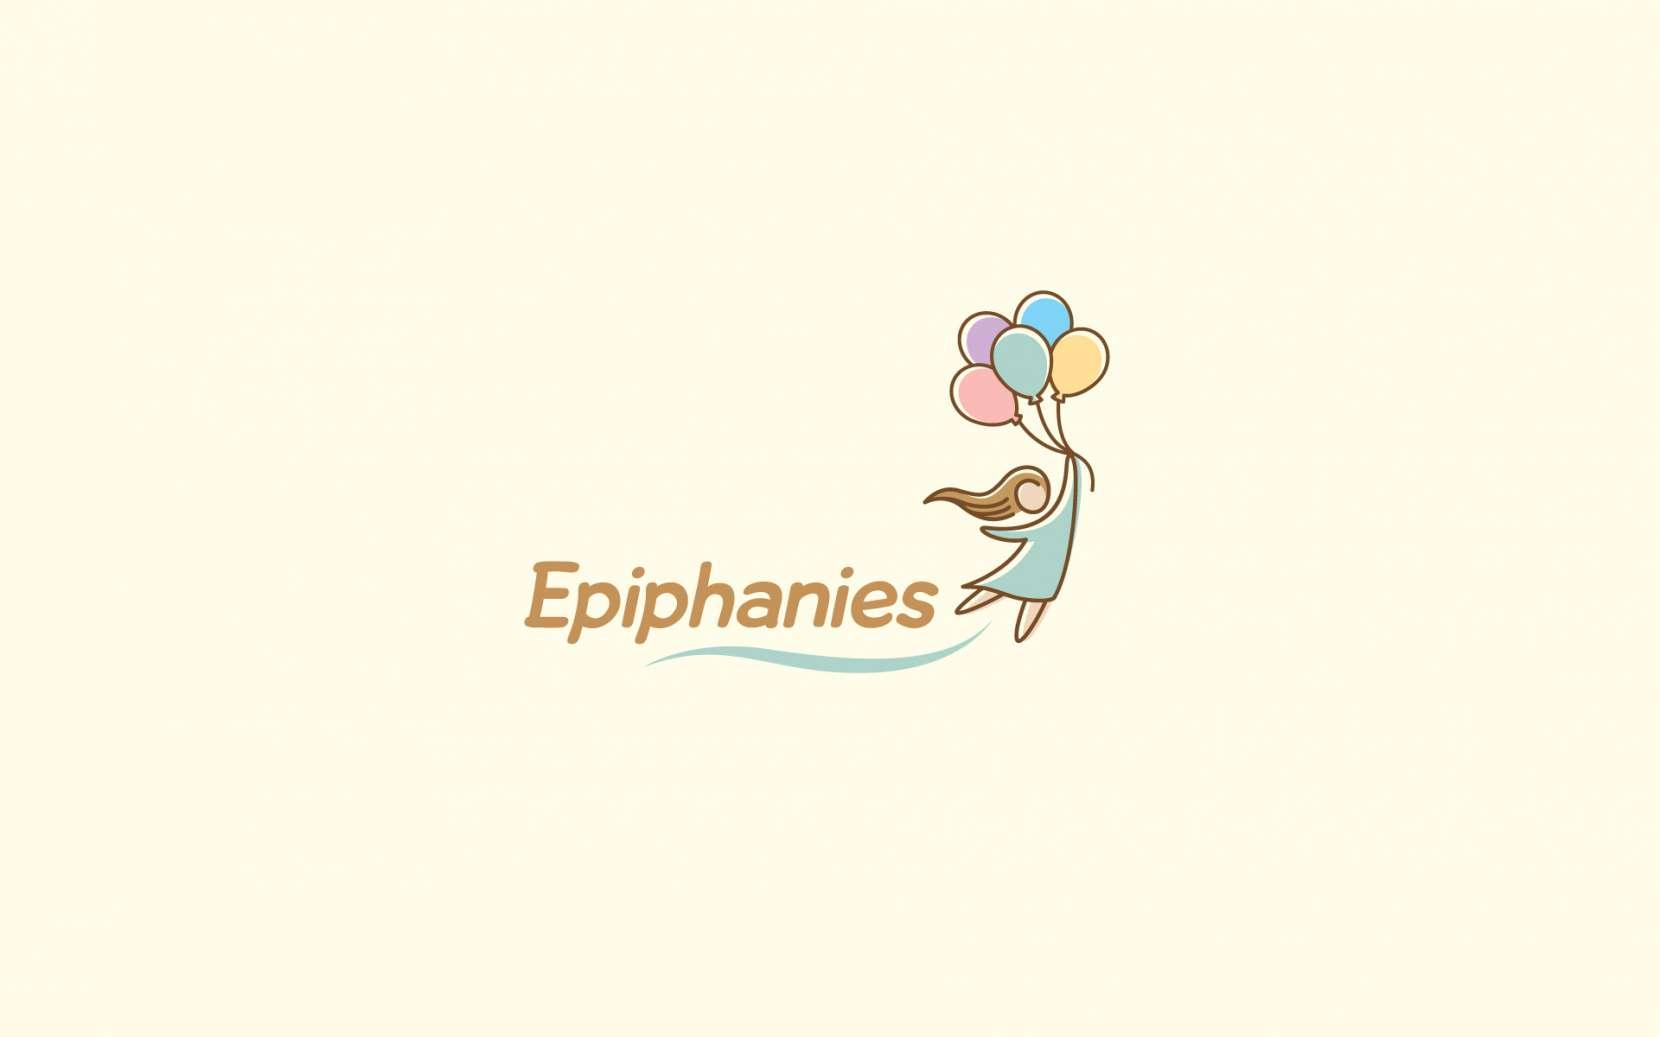 Epiphanies.jpg